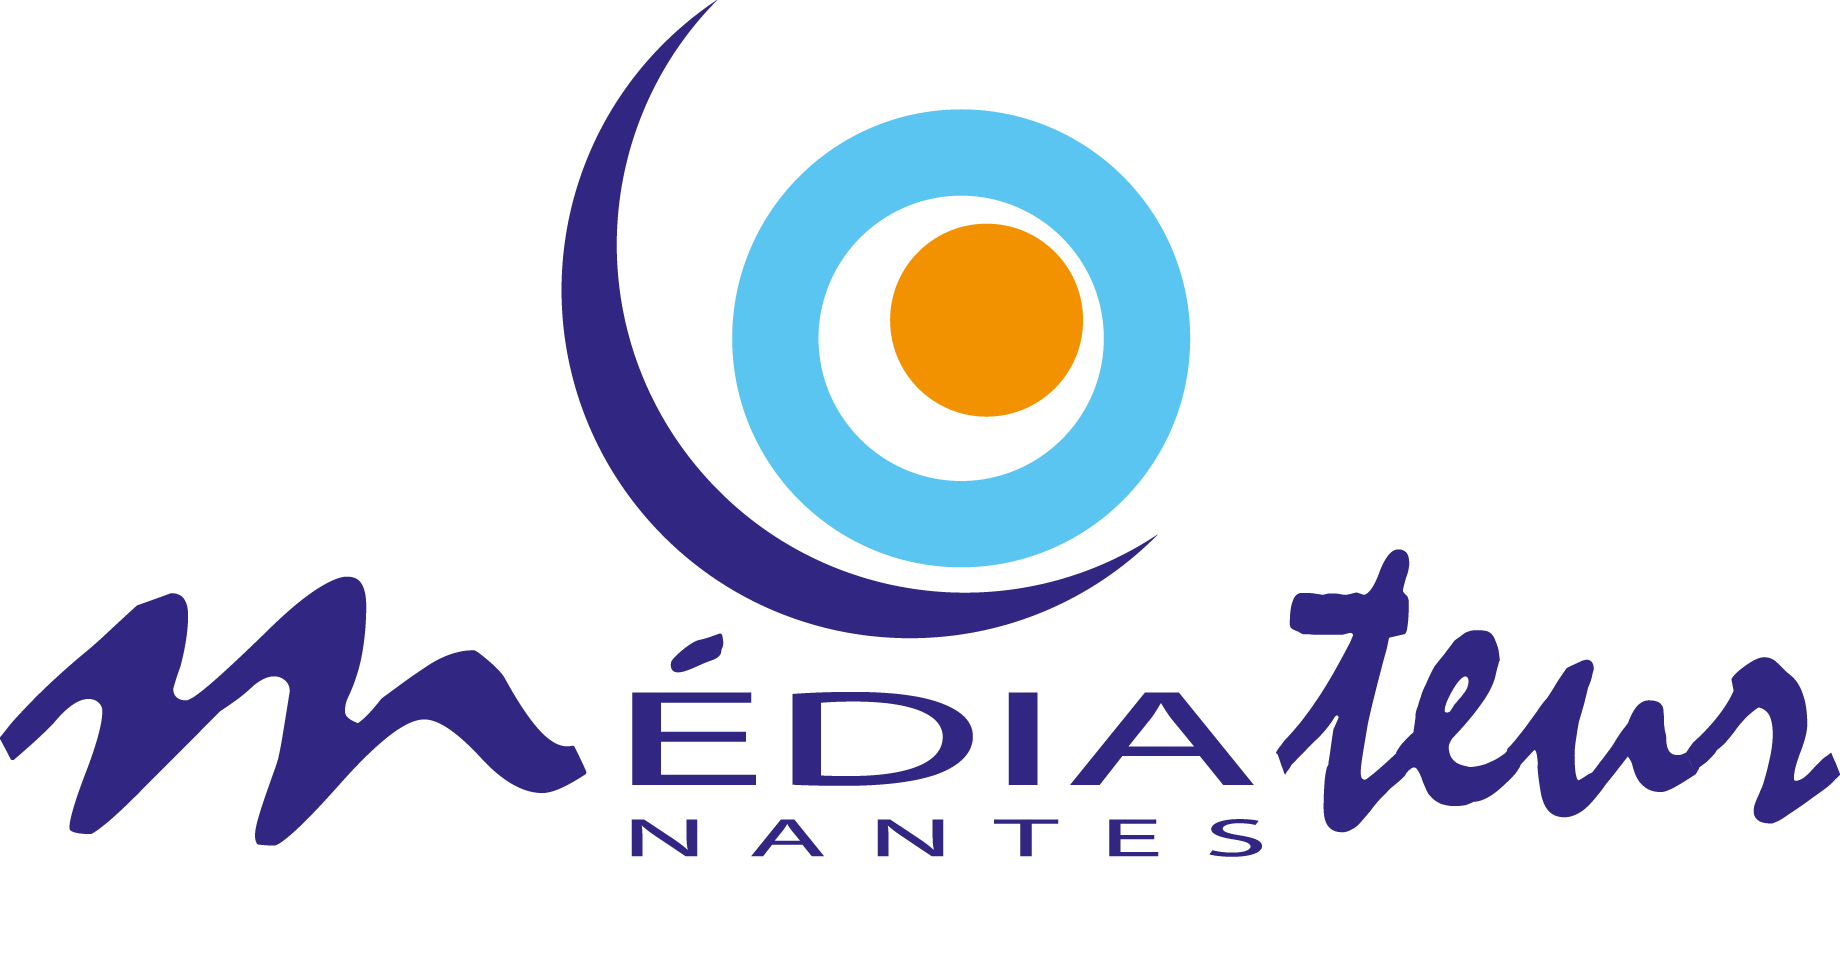 Médiateur Nantes